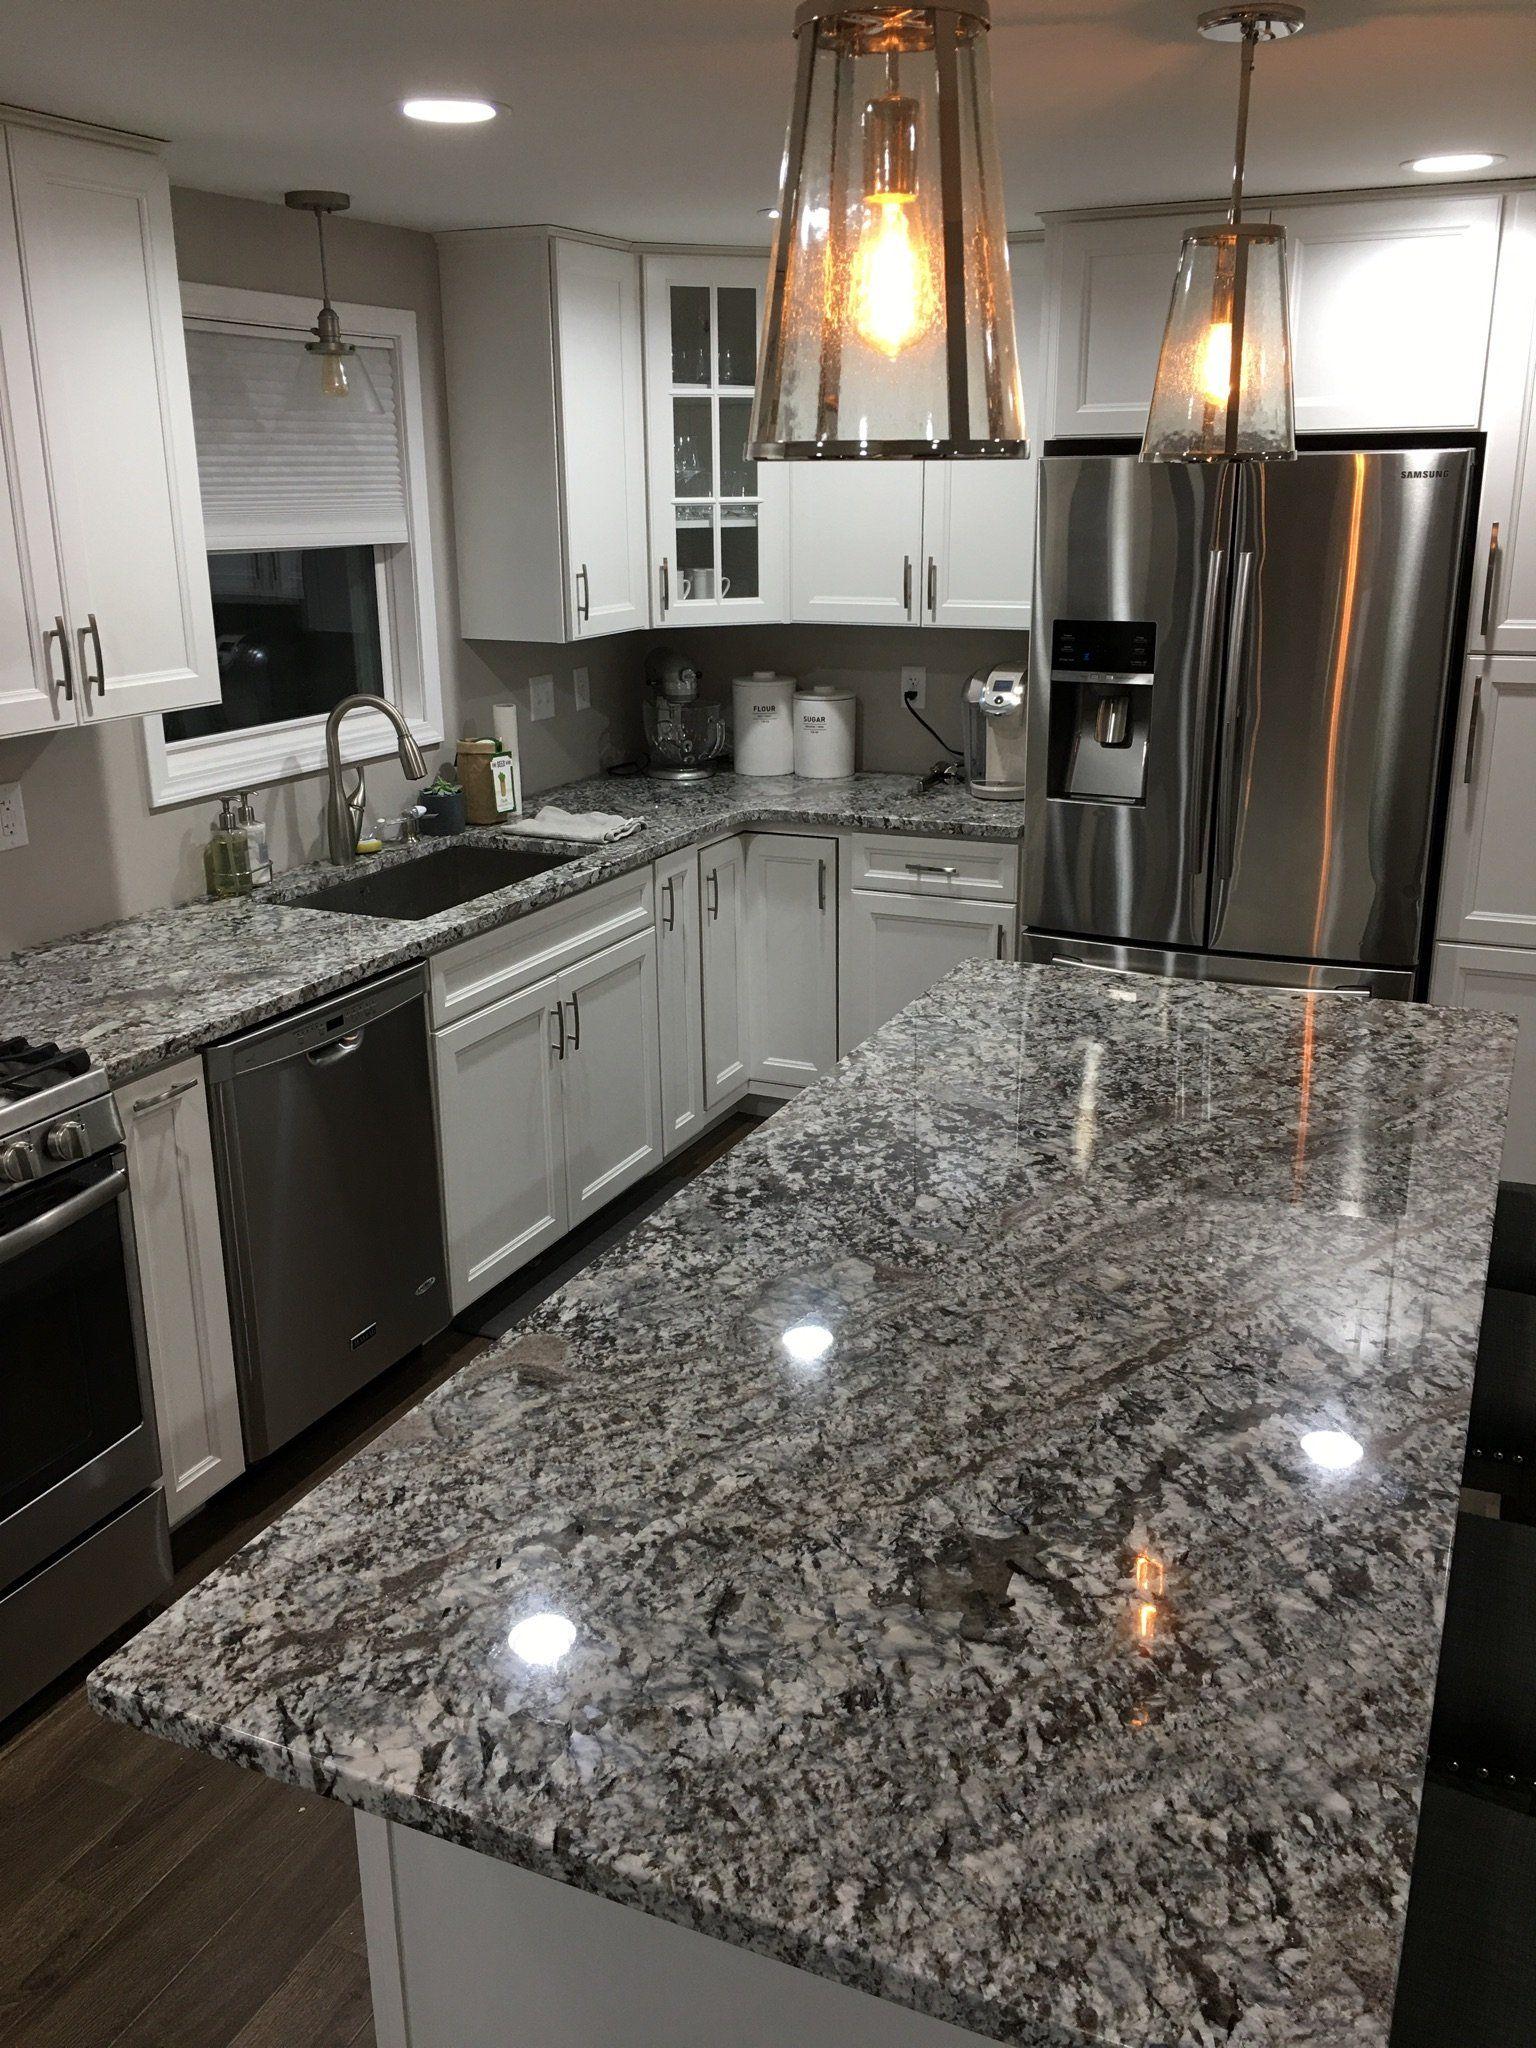 Pin By Rm Tech Korea Stonetools Kore On H O M E In 2020 Marble Countertops Kitchen Countertop Design Marble Countertops